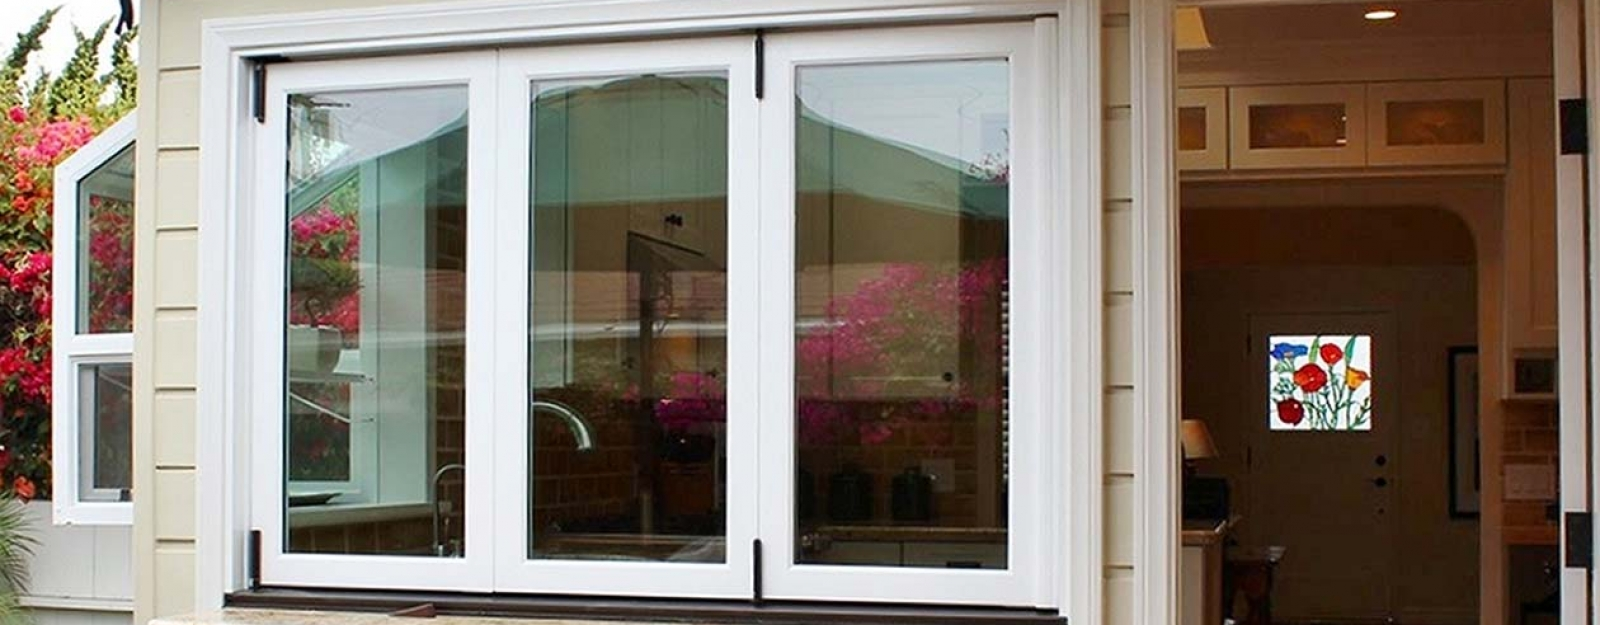 residential_folding_window_4